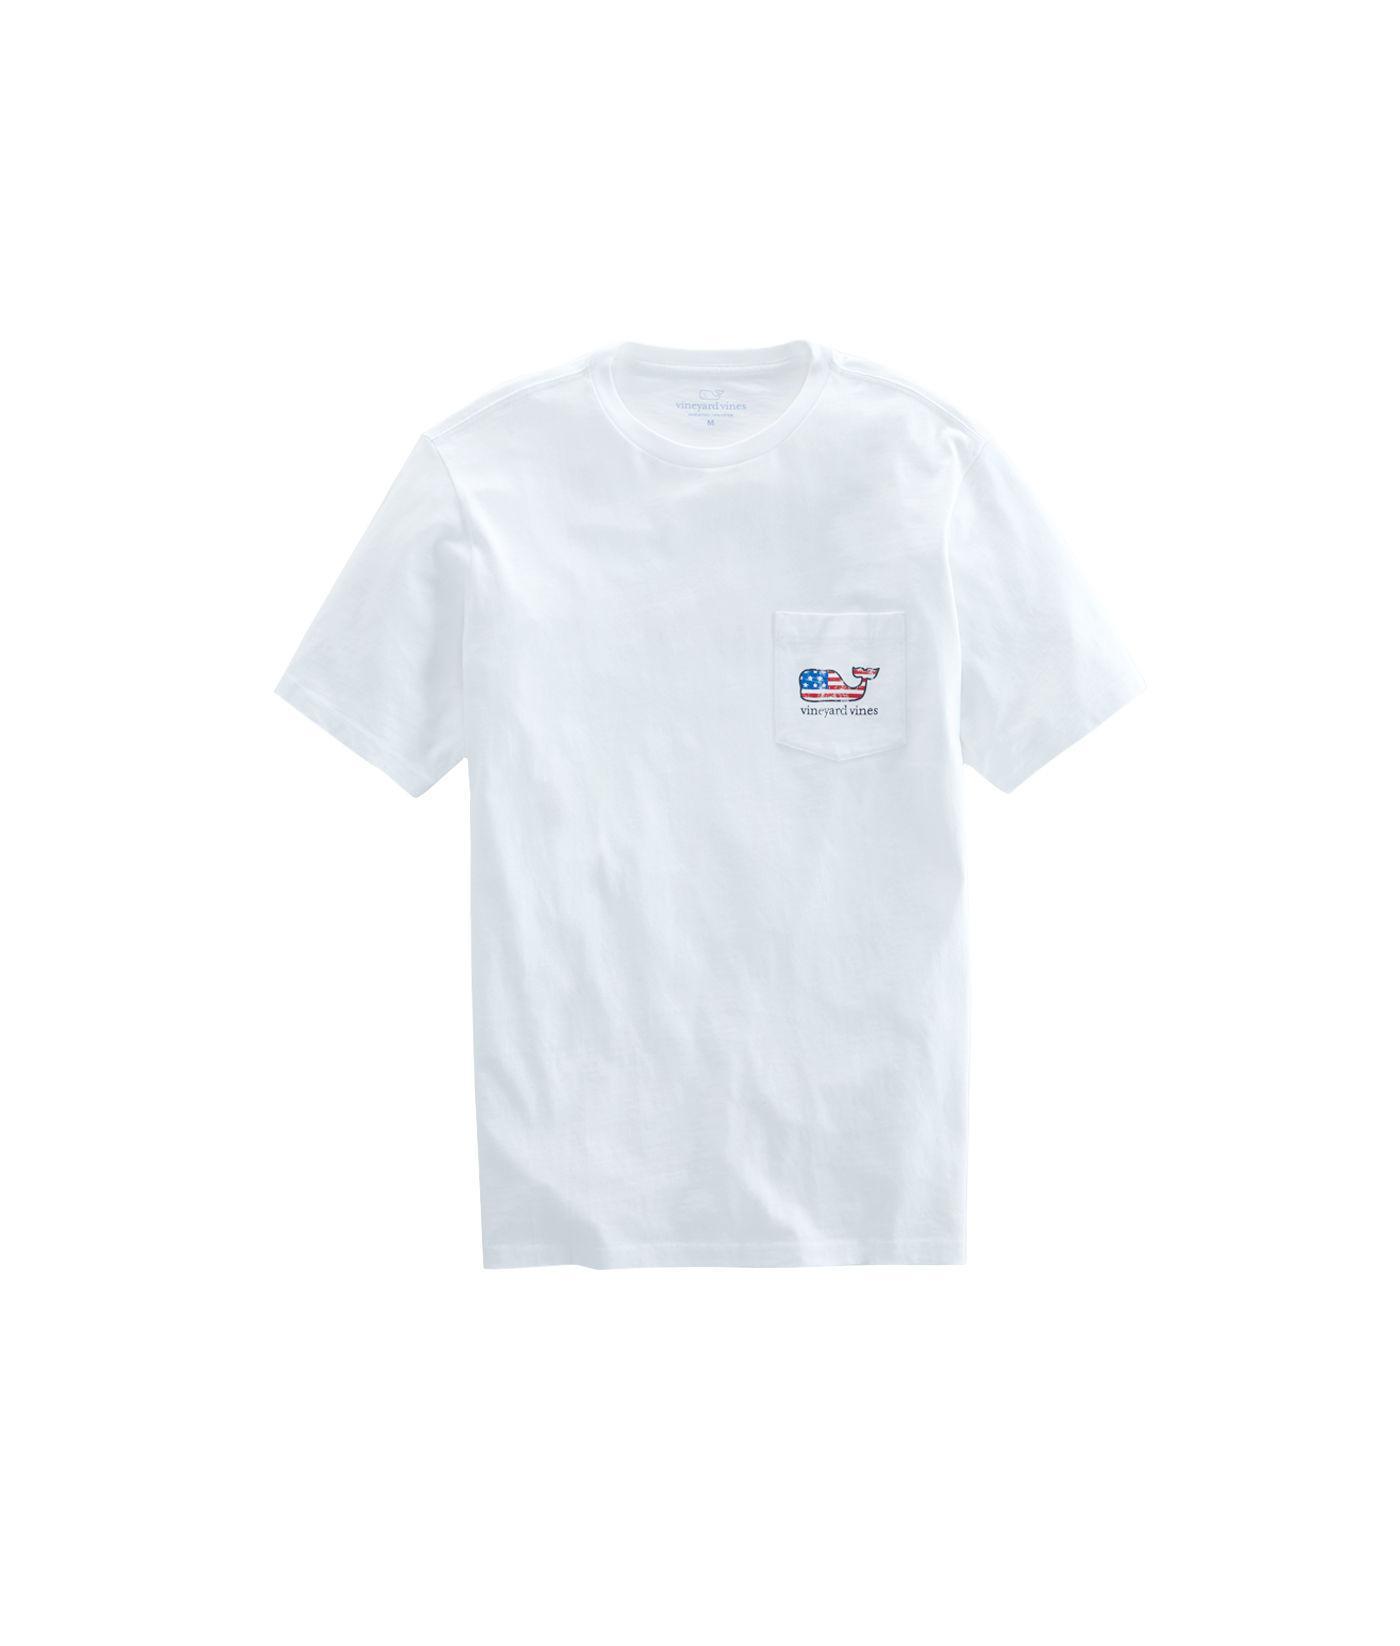 54c1bb3b Lyst - Vineyard Vines Flag Whale Pocket T-shirt in White for Men - Save 7%